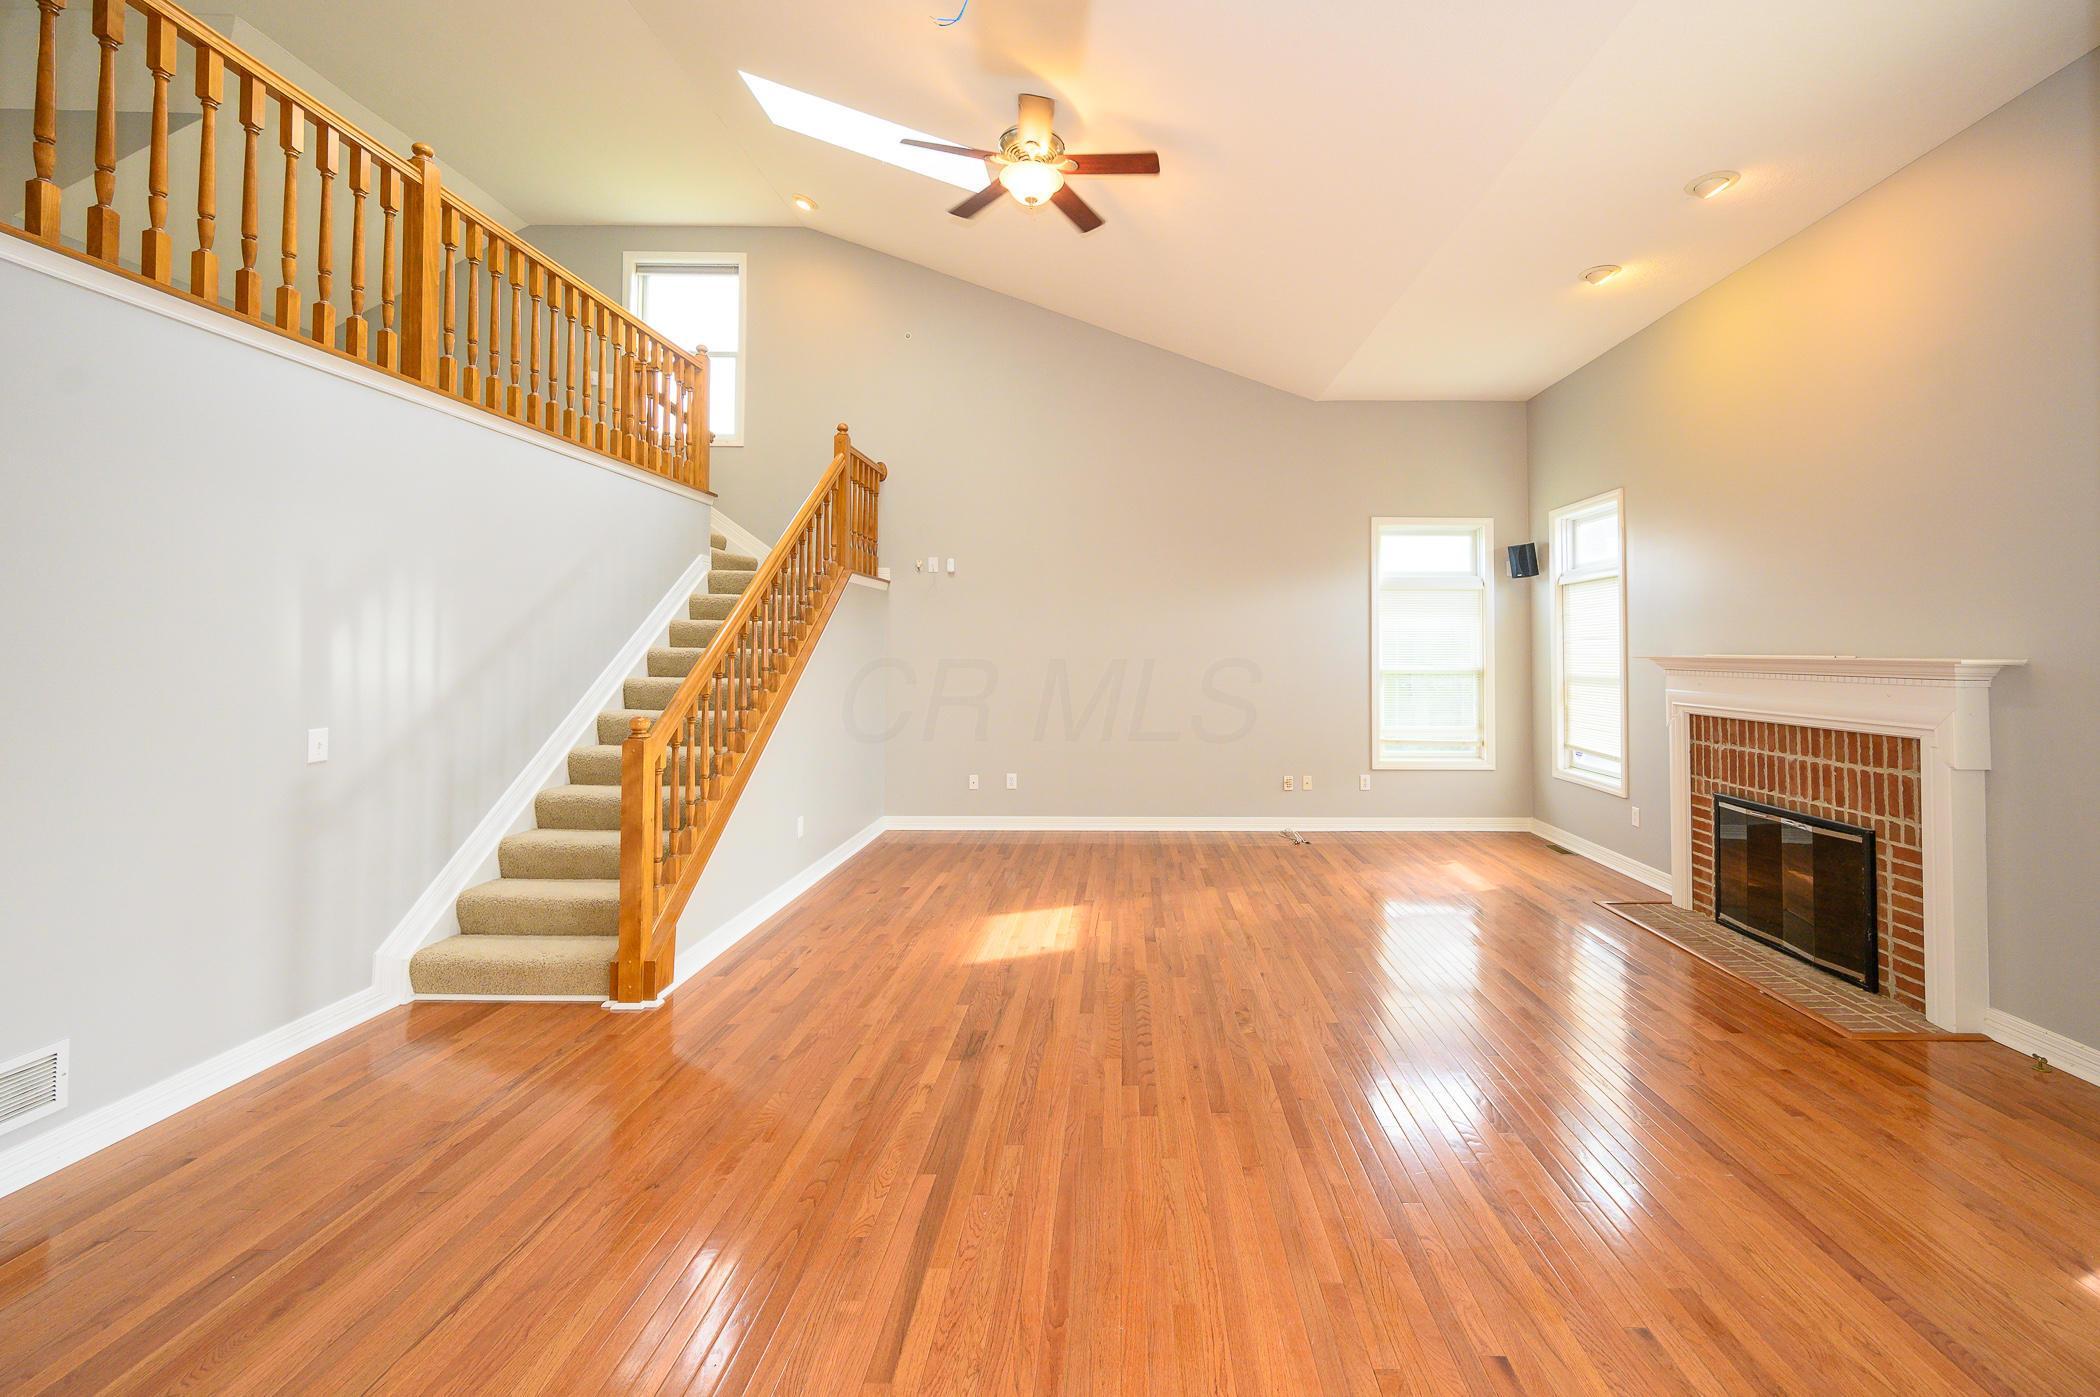 3975 Laurel Valley Drive, Powell, Ohio 43065, 4 Bedrooms Bedrooms, ,3 BathroomsBathrooms,Residential,For Sale,Laurel Valley,221000705